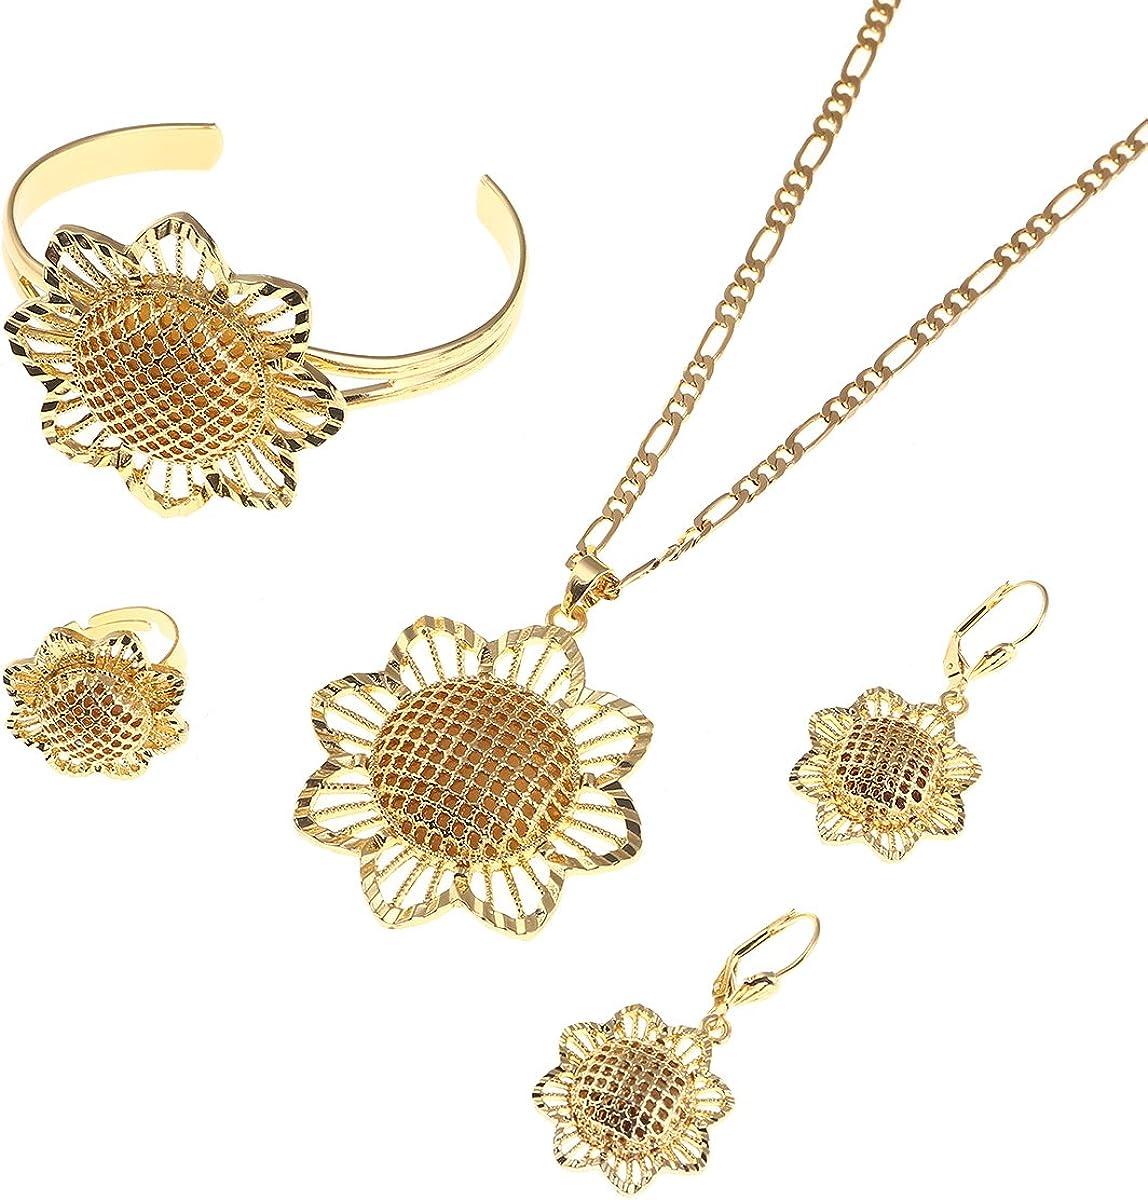 Flower Ethiopian Sets Eritrea Habesha Africa Bridals Wedding Jewelry Gift Necklace Pendnat Earrings Set